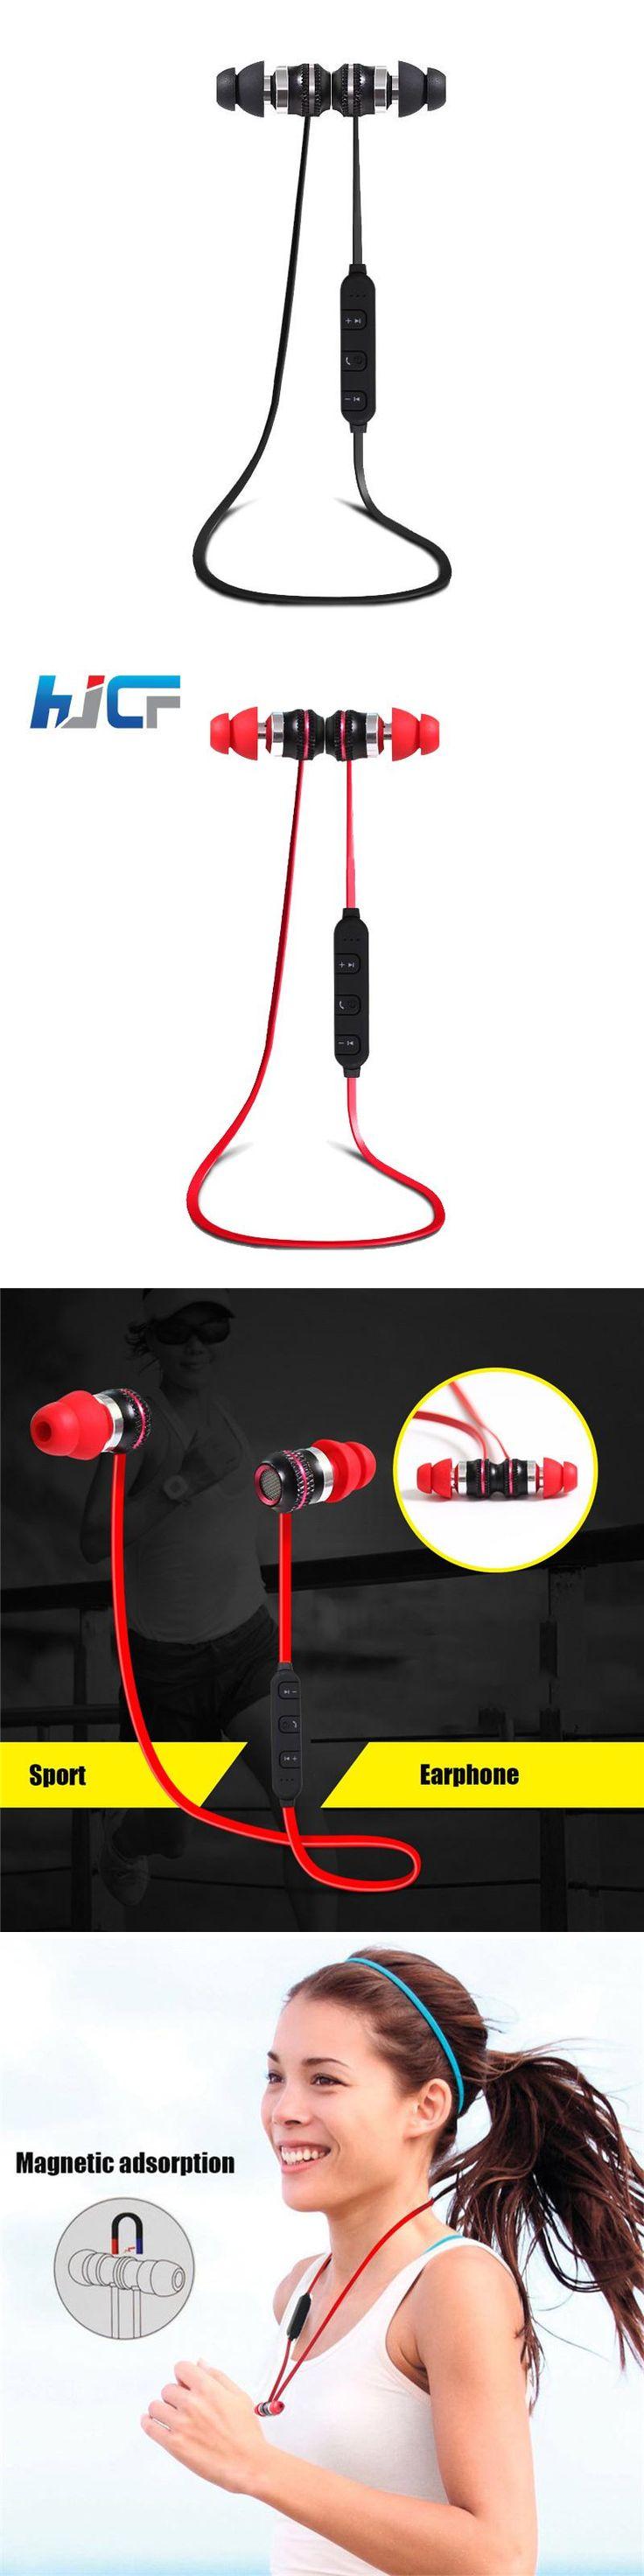 High-End HJCF Magnetic Steelseries Bluetooth Earphone Sport Stereo Super Bass Kulaklik For iphone Samsung Audifonos HS11